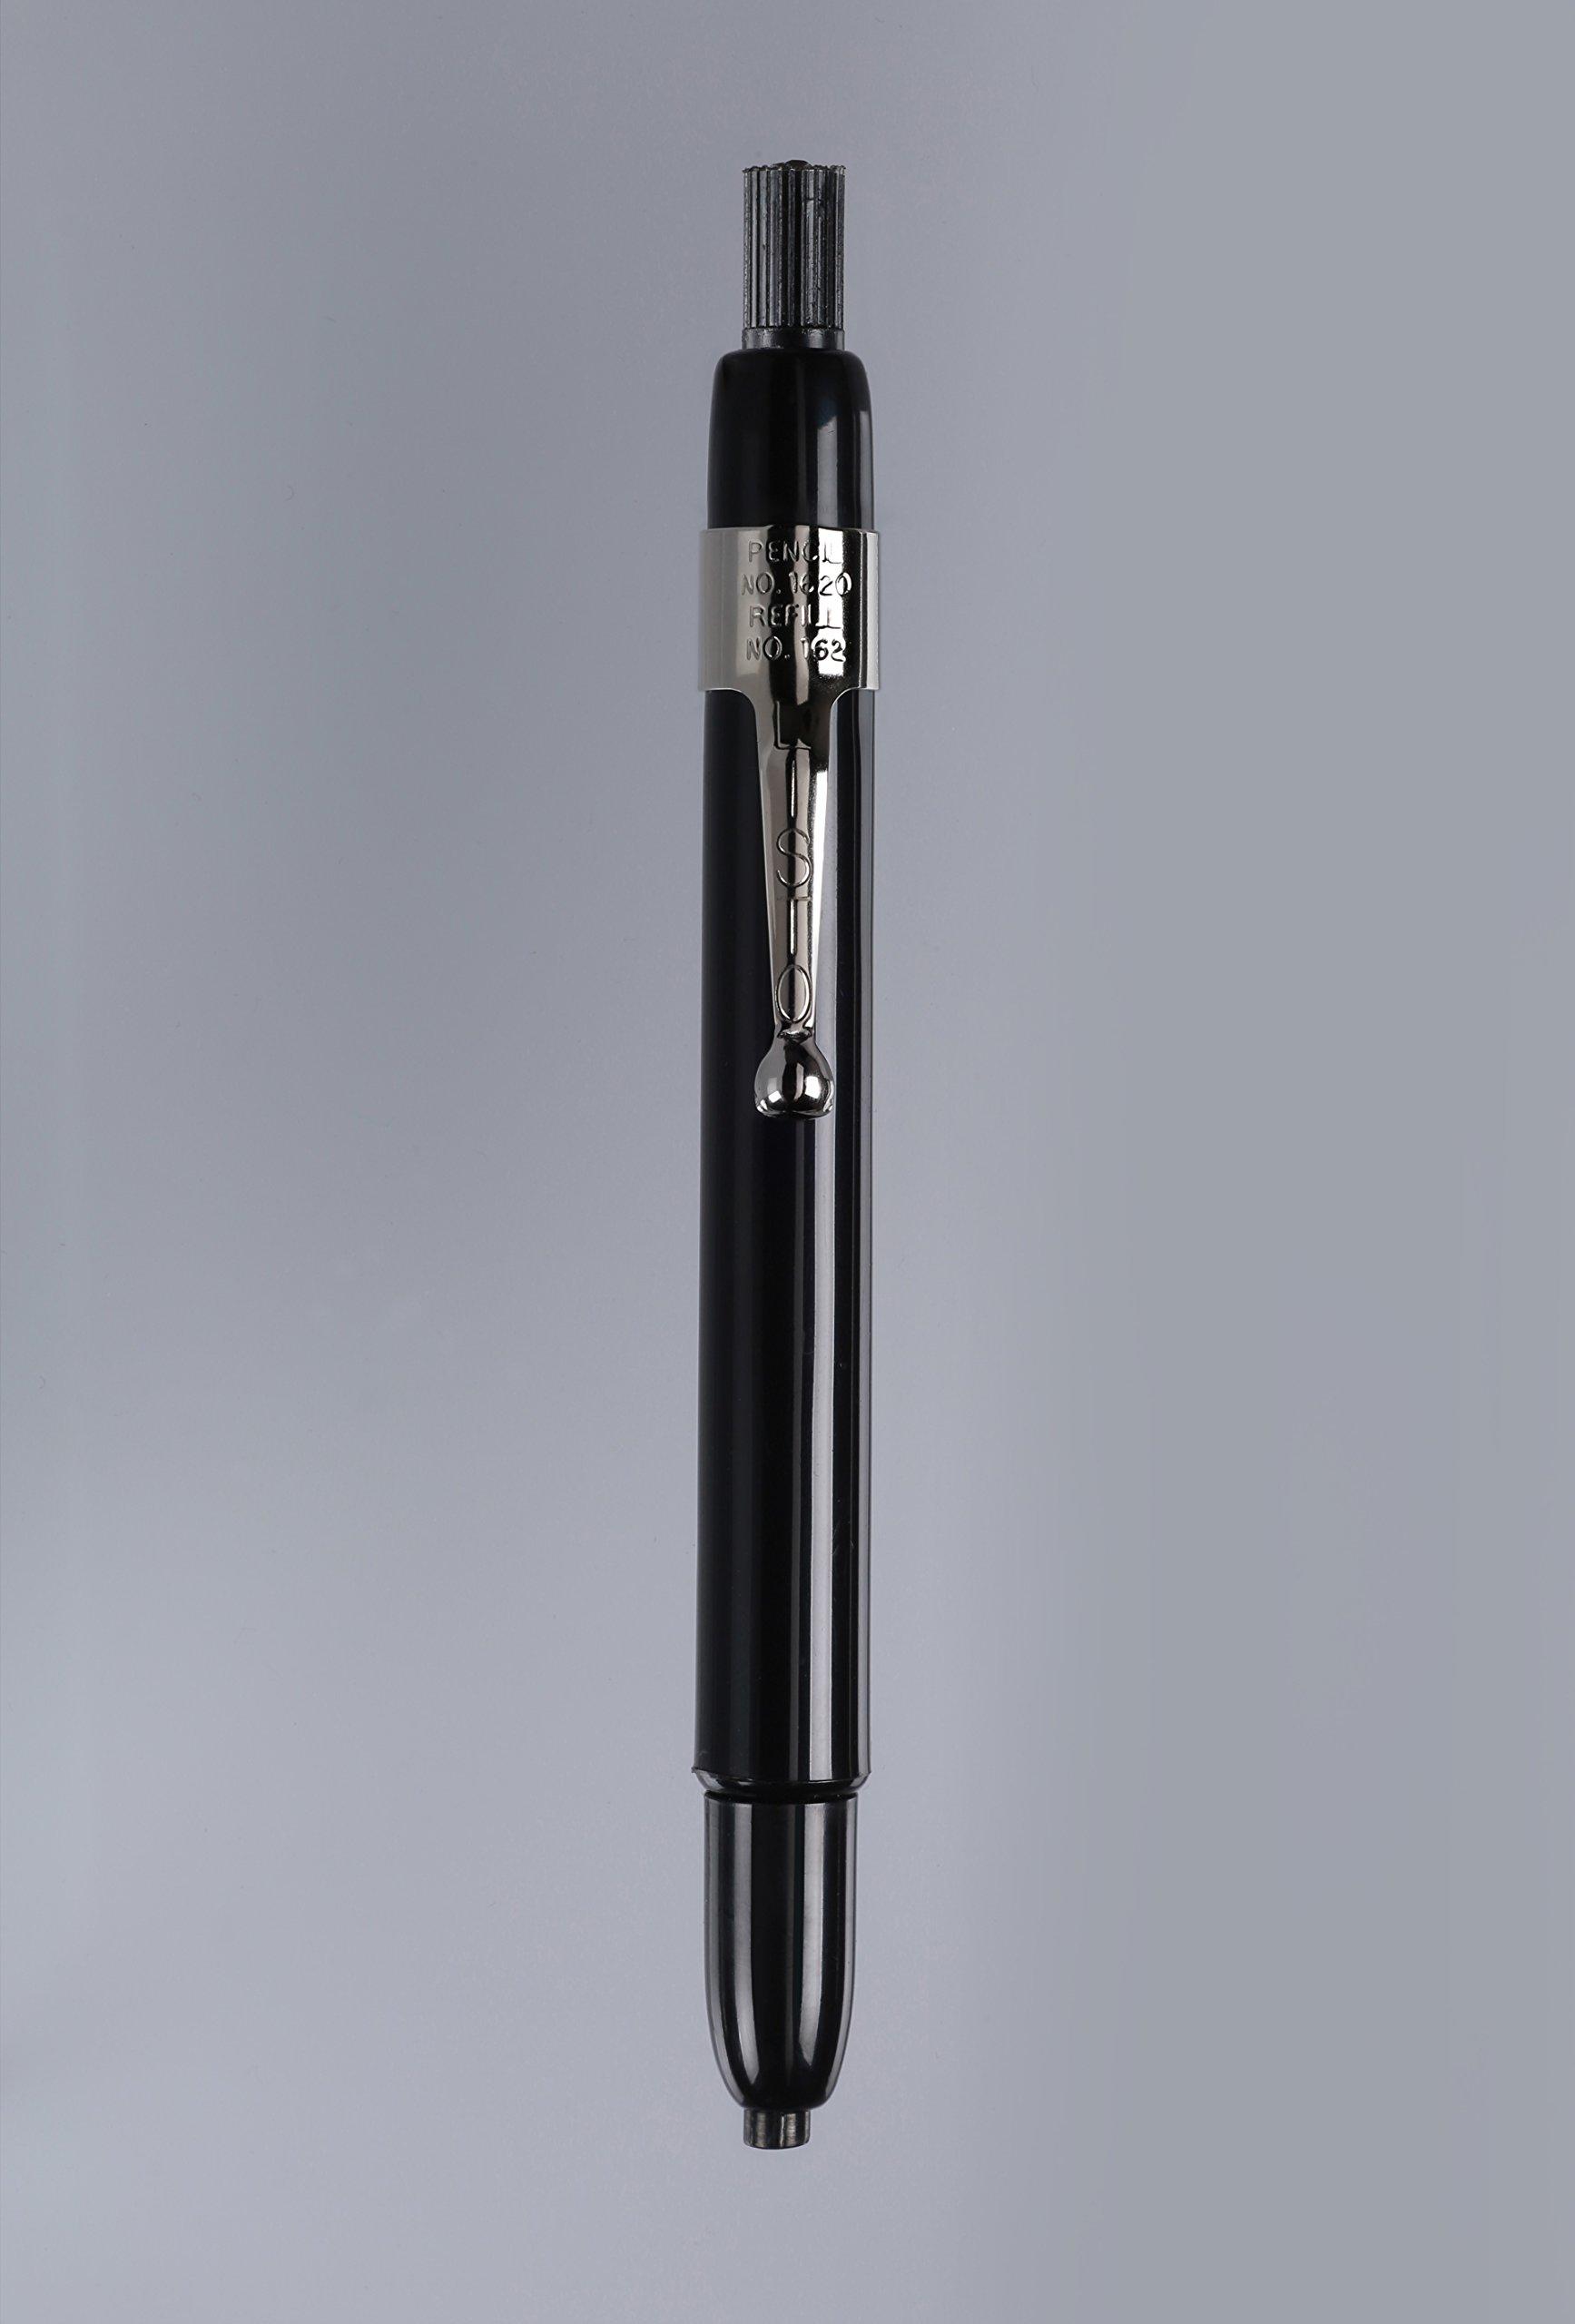 Bundle of Listo 1620 Marking Pencil/Grease Pencils/China Marking Pencils/Wax Pencils - Black, Box of 12 With 72 Refills With Bonus Magnetic Memo Clip by Listo (Image #2)